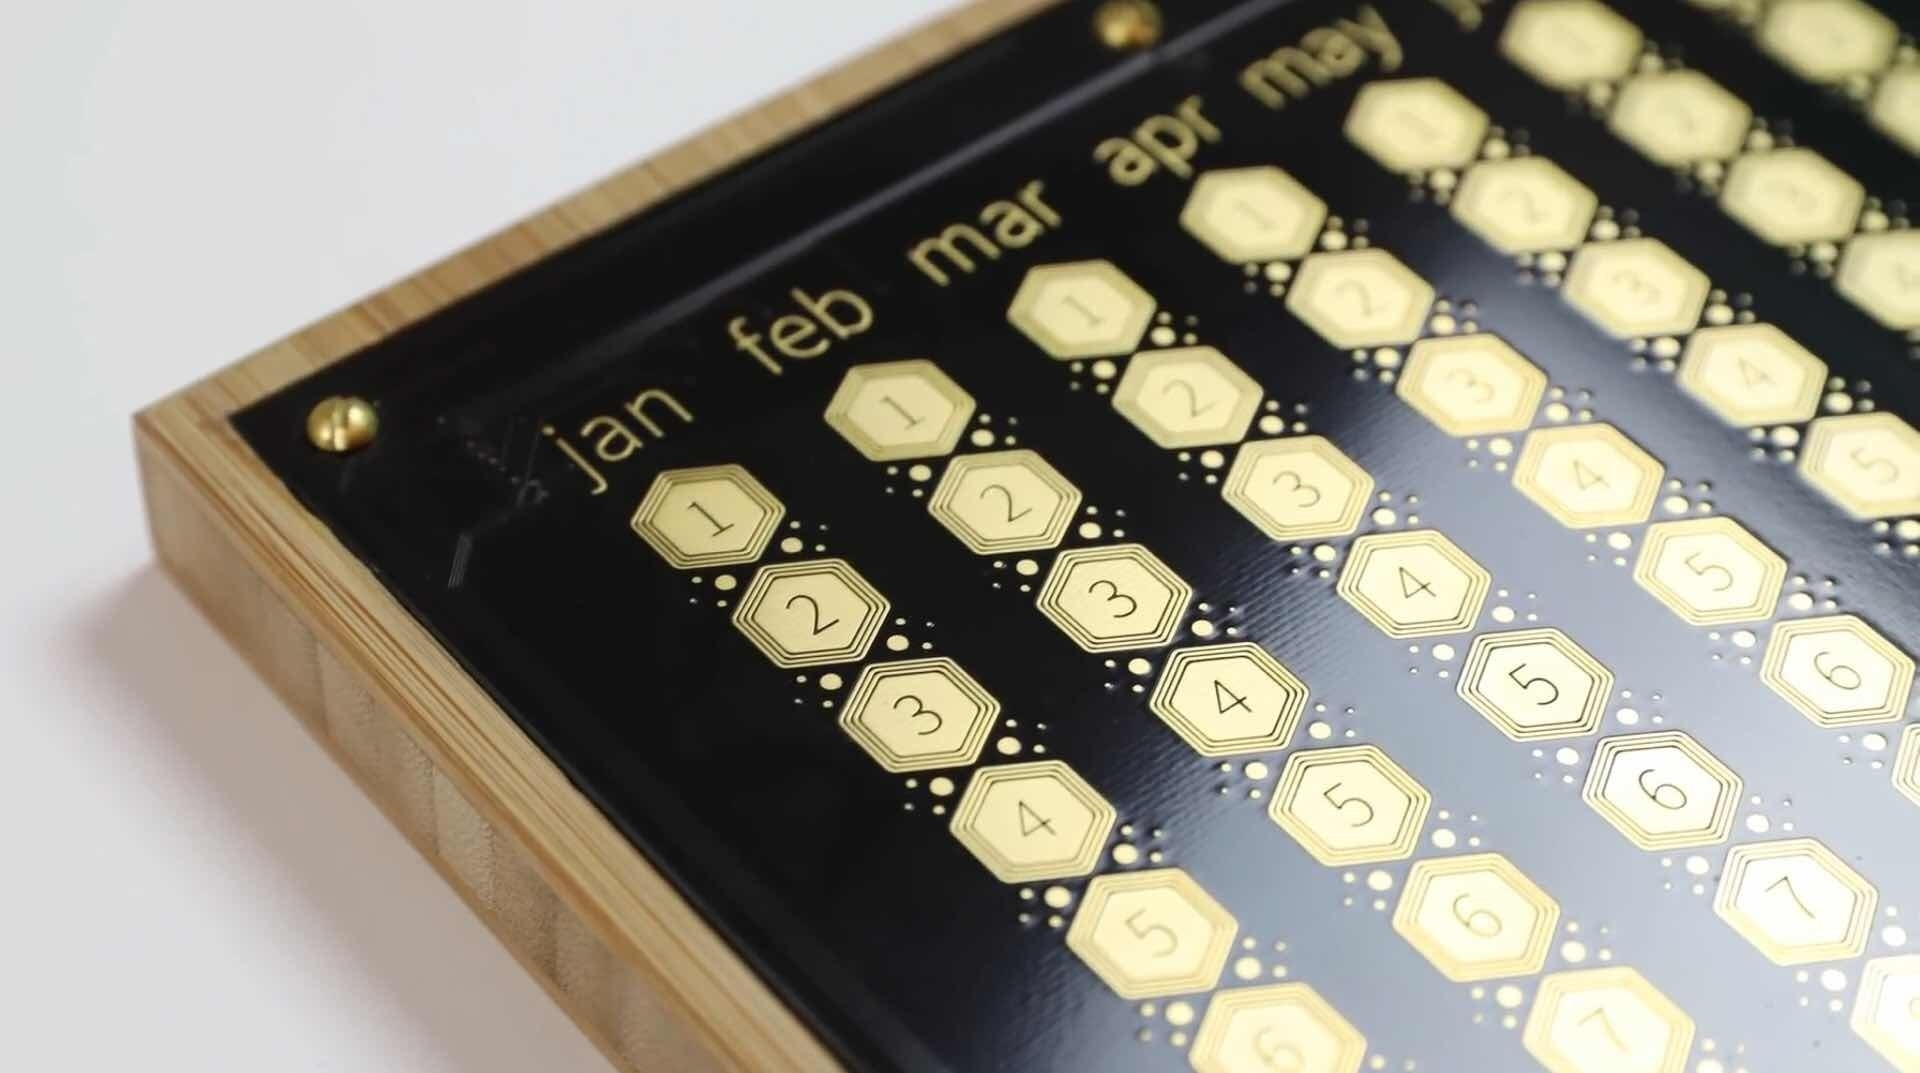 Simone Giertz's Every Day Calendar [Kickstarter] — Tools And